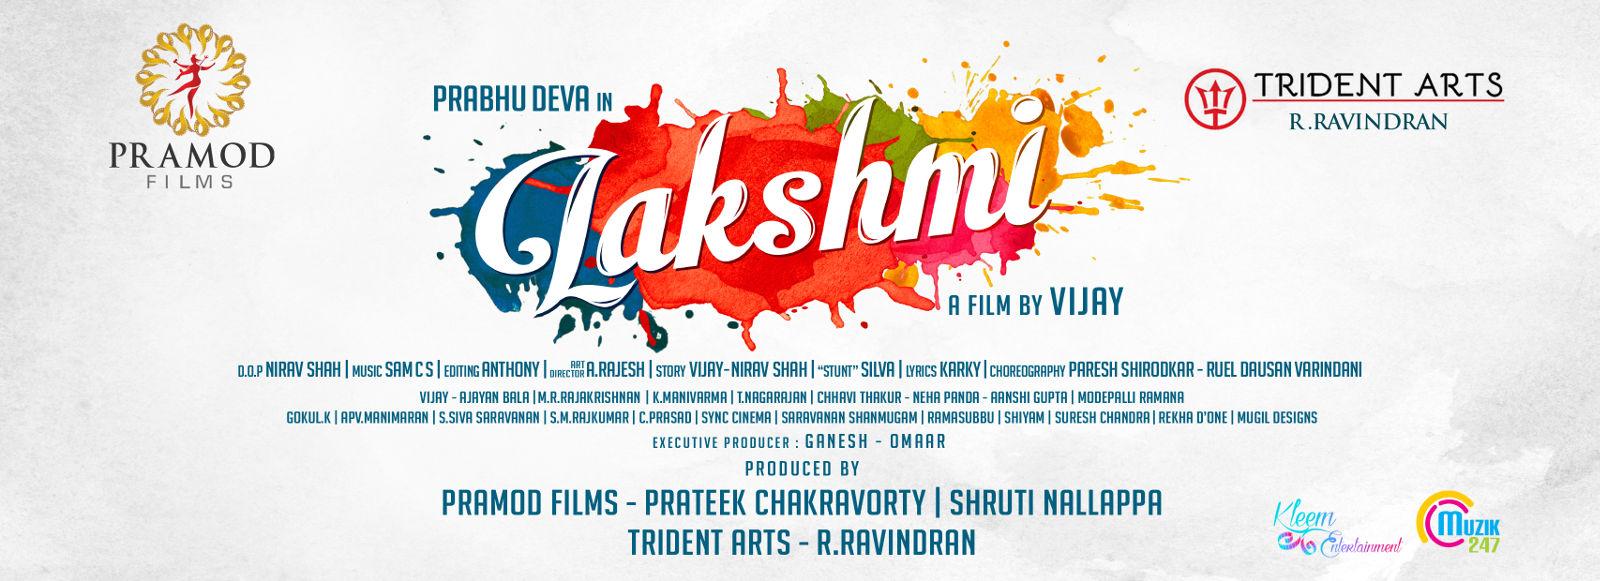 prabhu deva al vijay lakshmi movie title poster